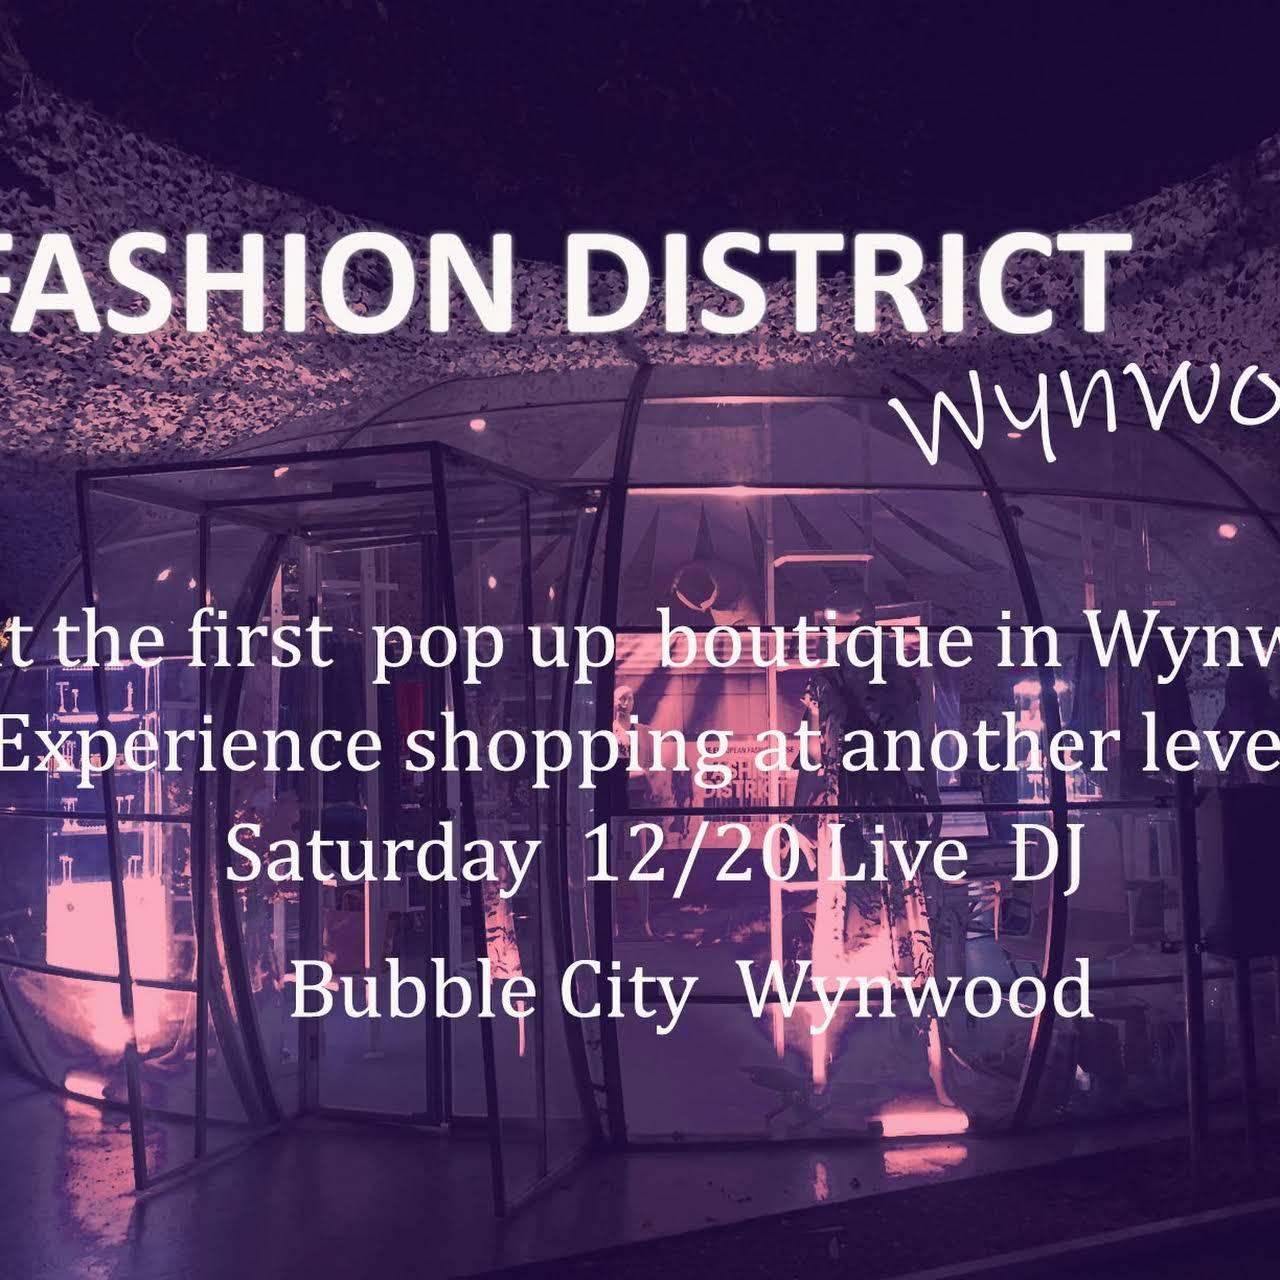 Fashion District Wynwood - Outlet Boutique in Wynwood - Miami